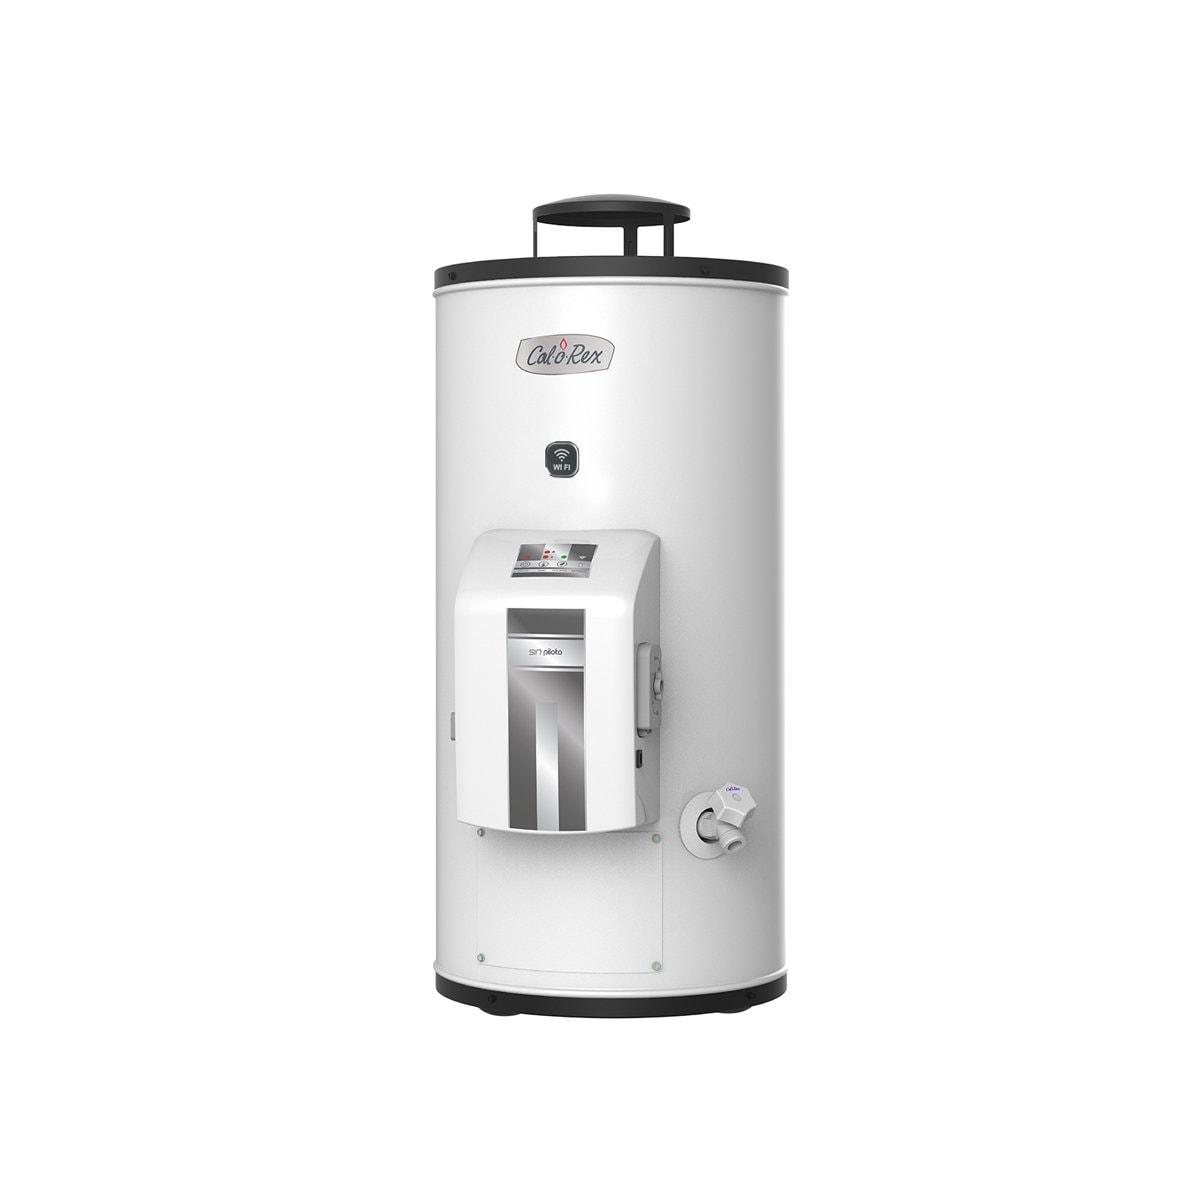 Calentador Calorex G-10 Sin Piloto Wi-Fi Gas L.p.